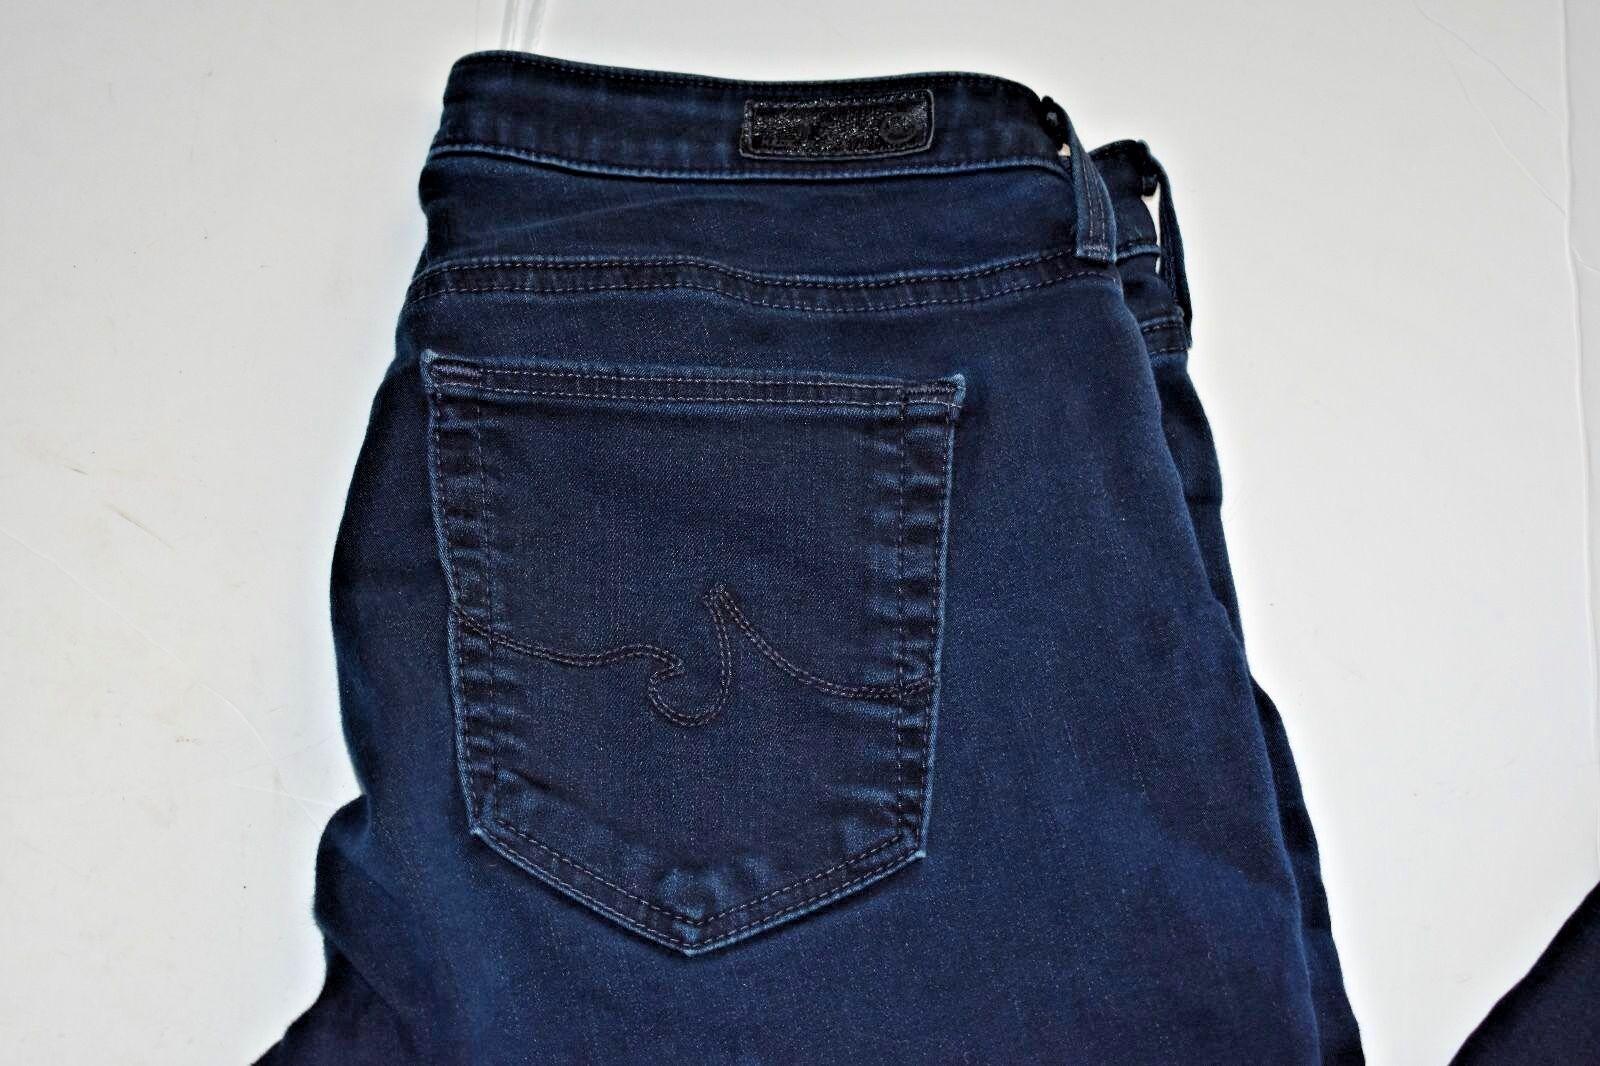 AG Adriano Goldschmied The absolu Legging Extreme Skinny Denim Jeans, Größe 29R